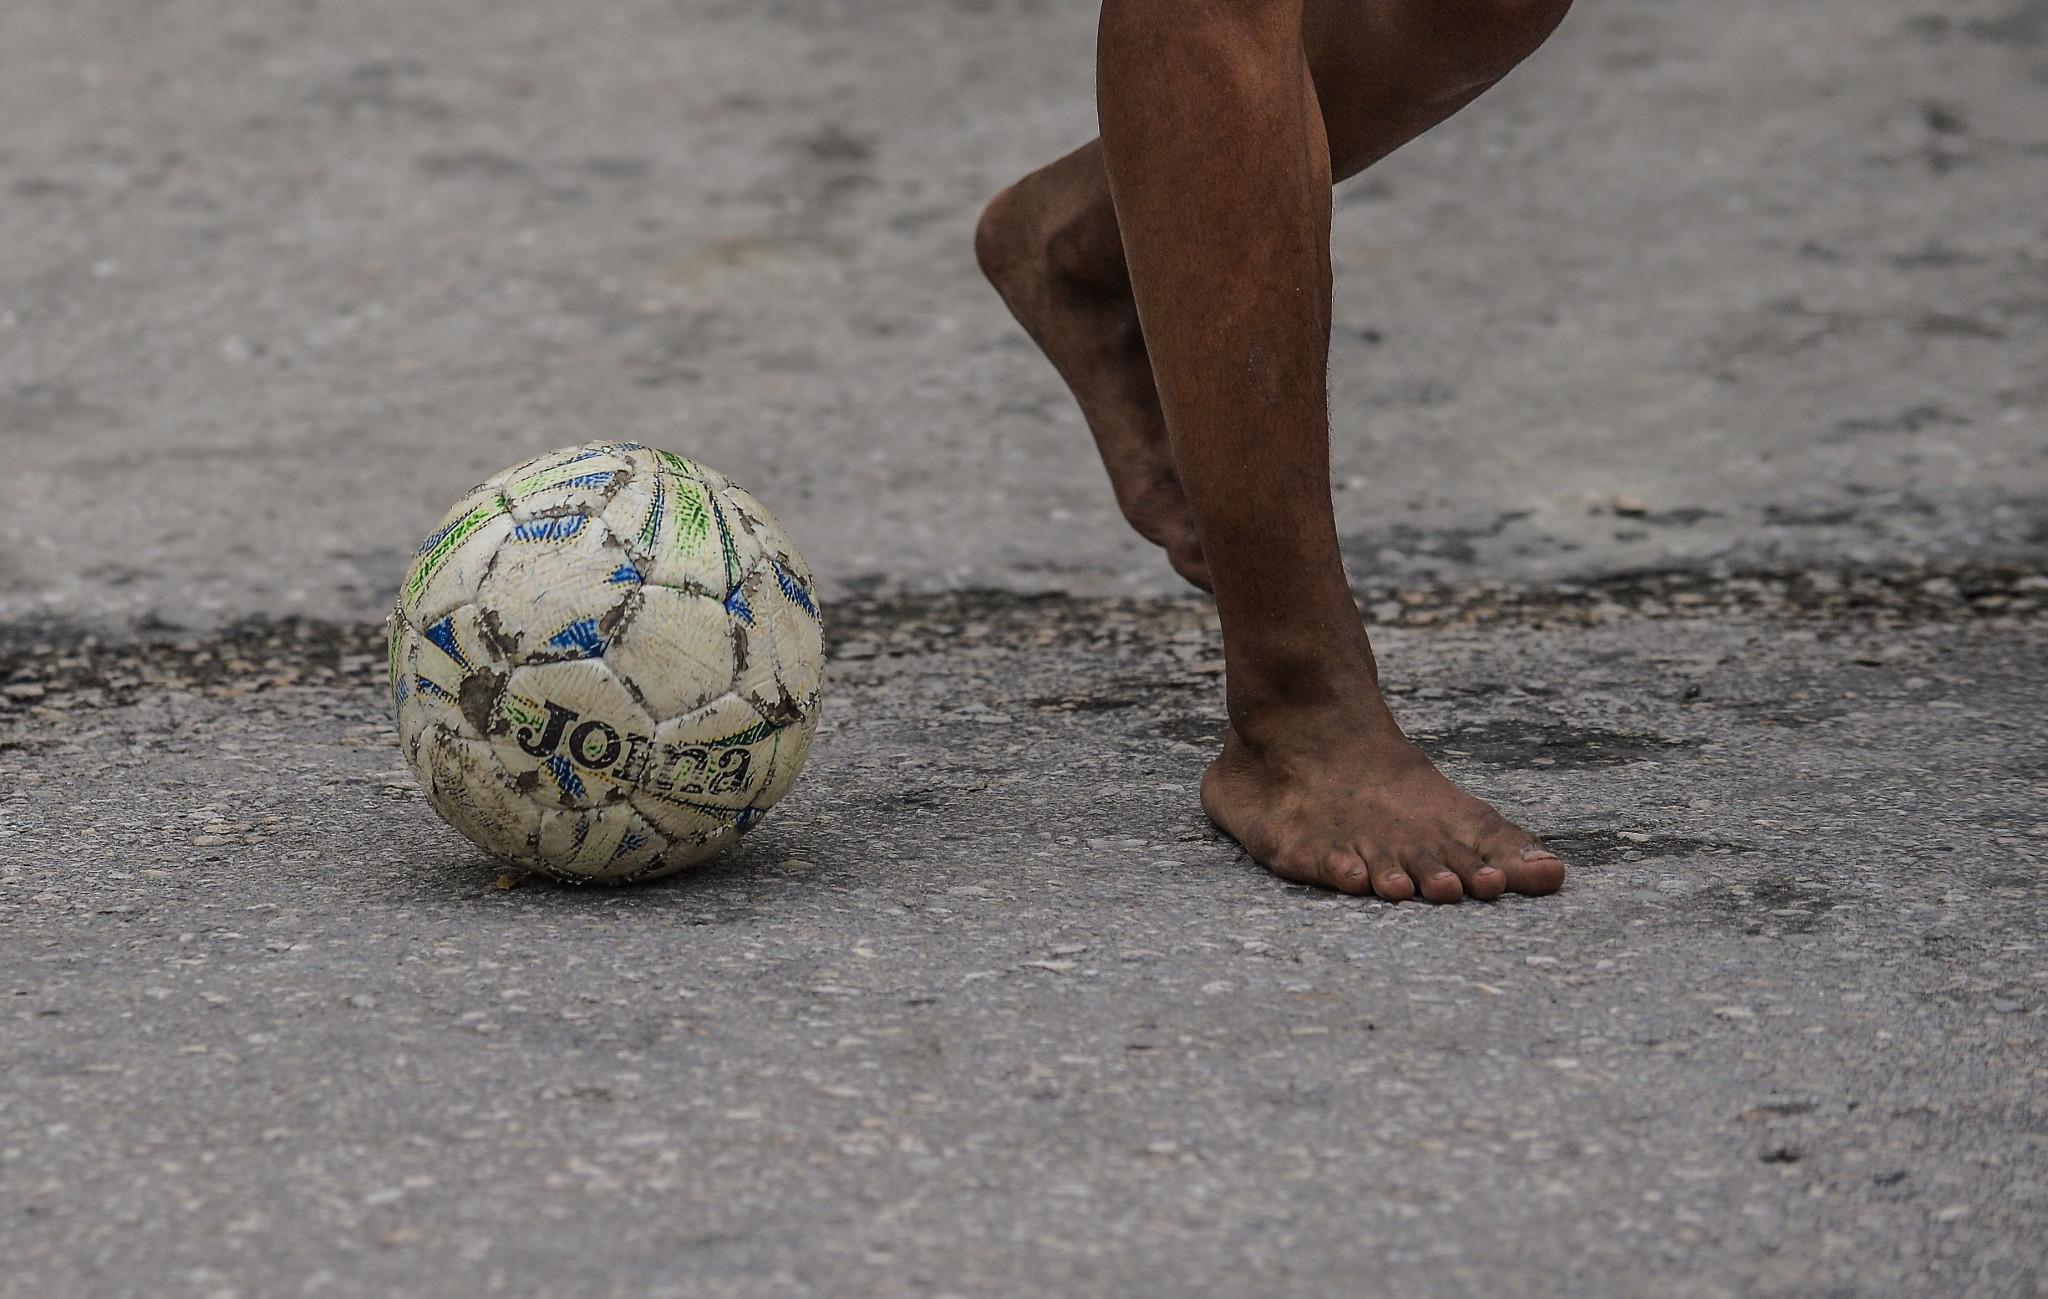 World Freestyle Football Association joins Global Esports Federation alliance